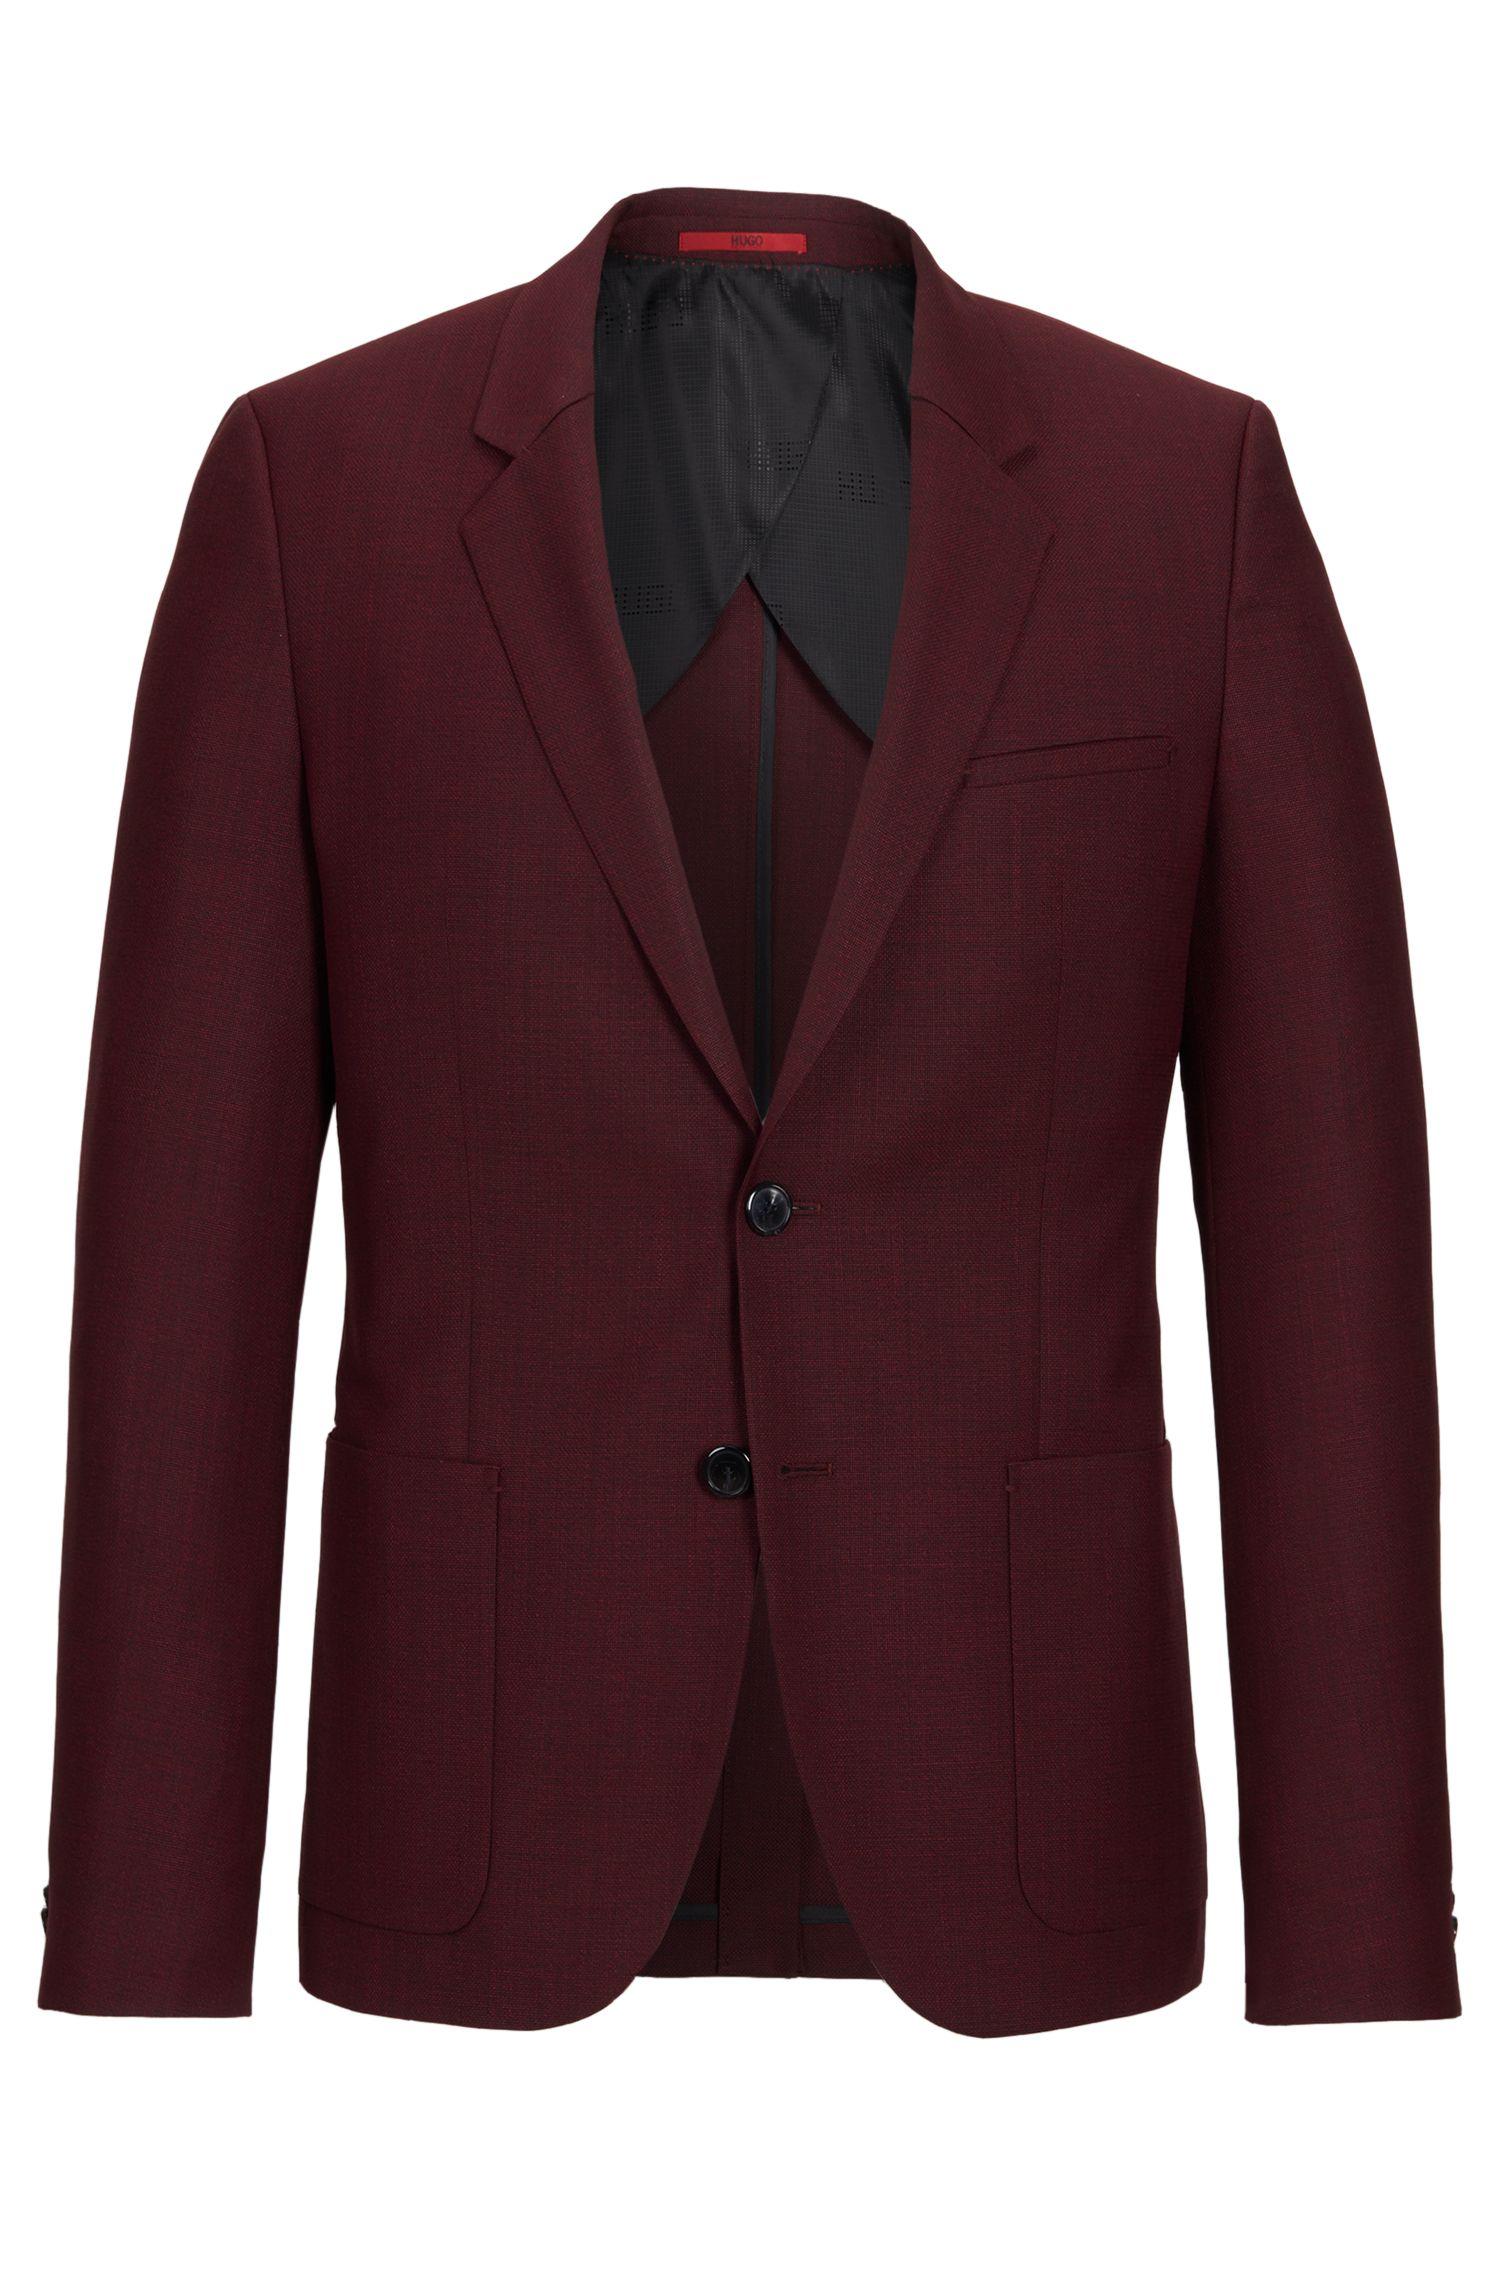 'Antanio' | Slim Fit, Italian Virgin Wool Sport Coat